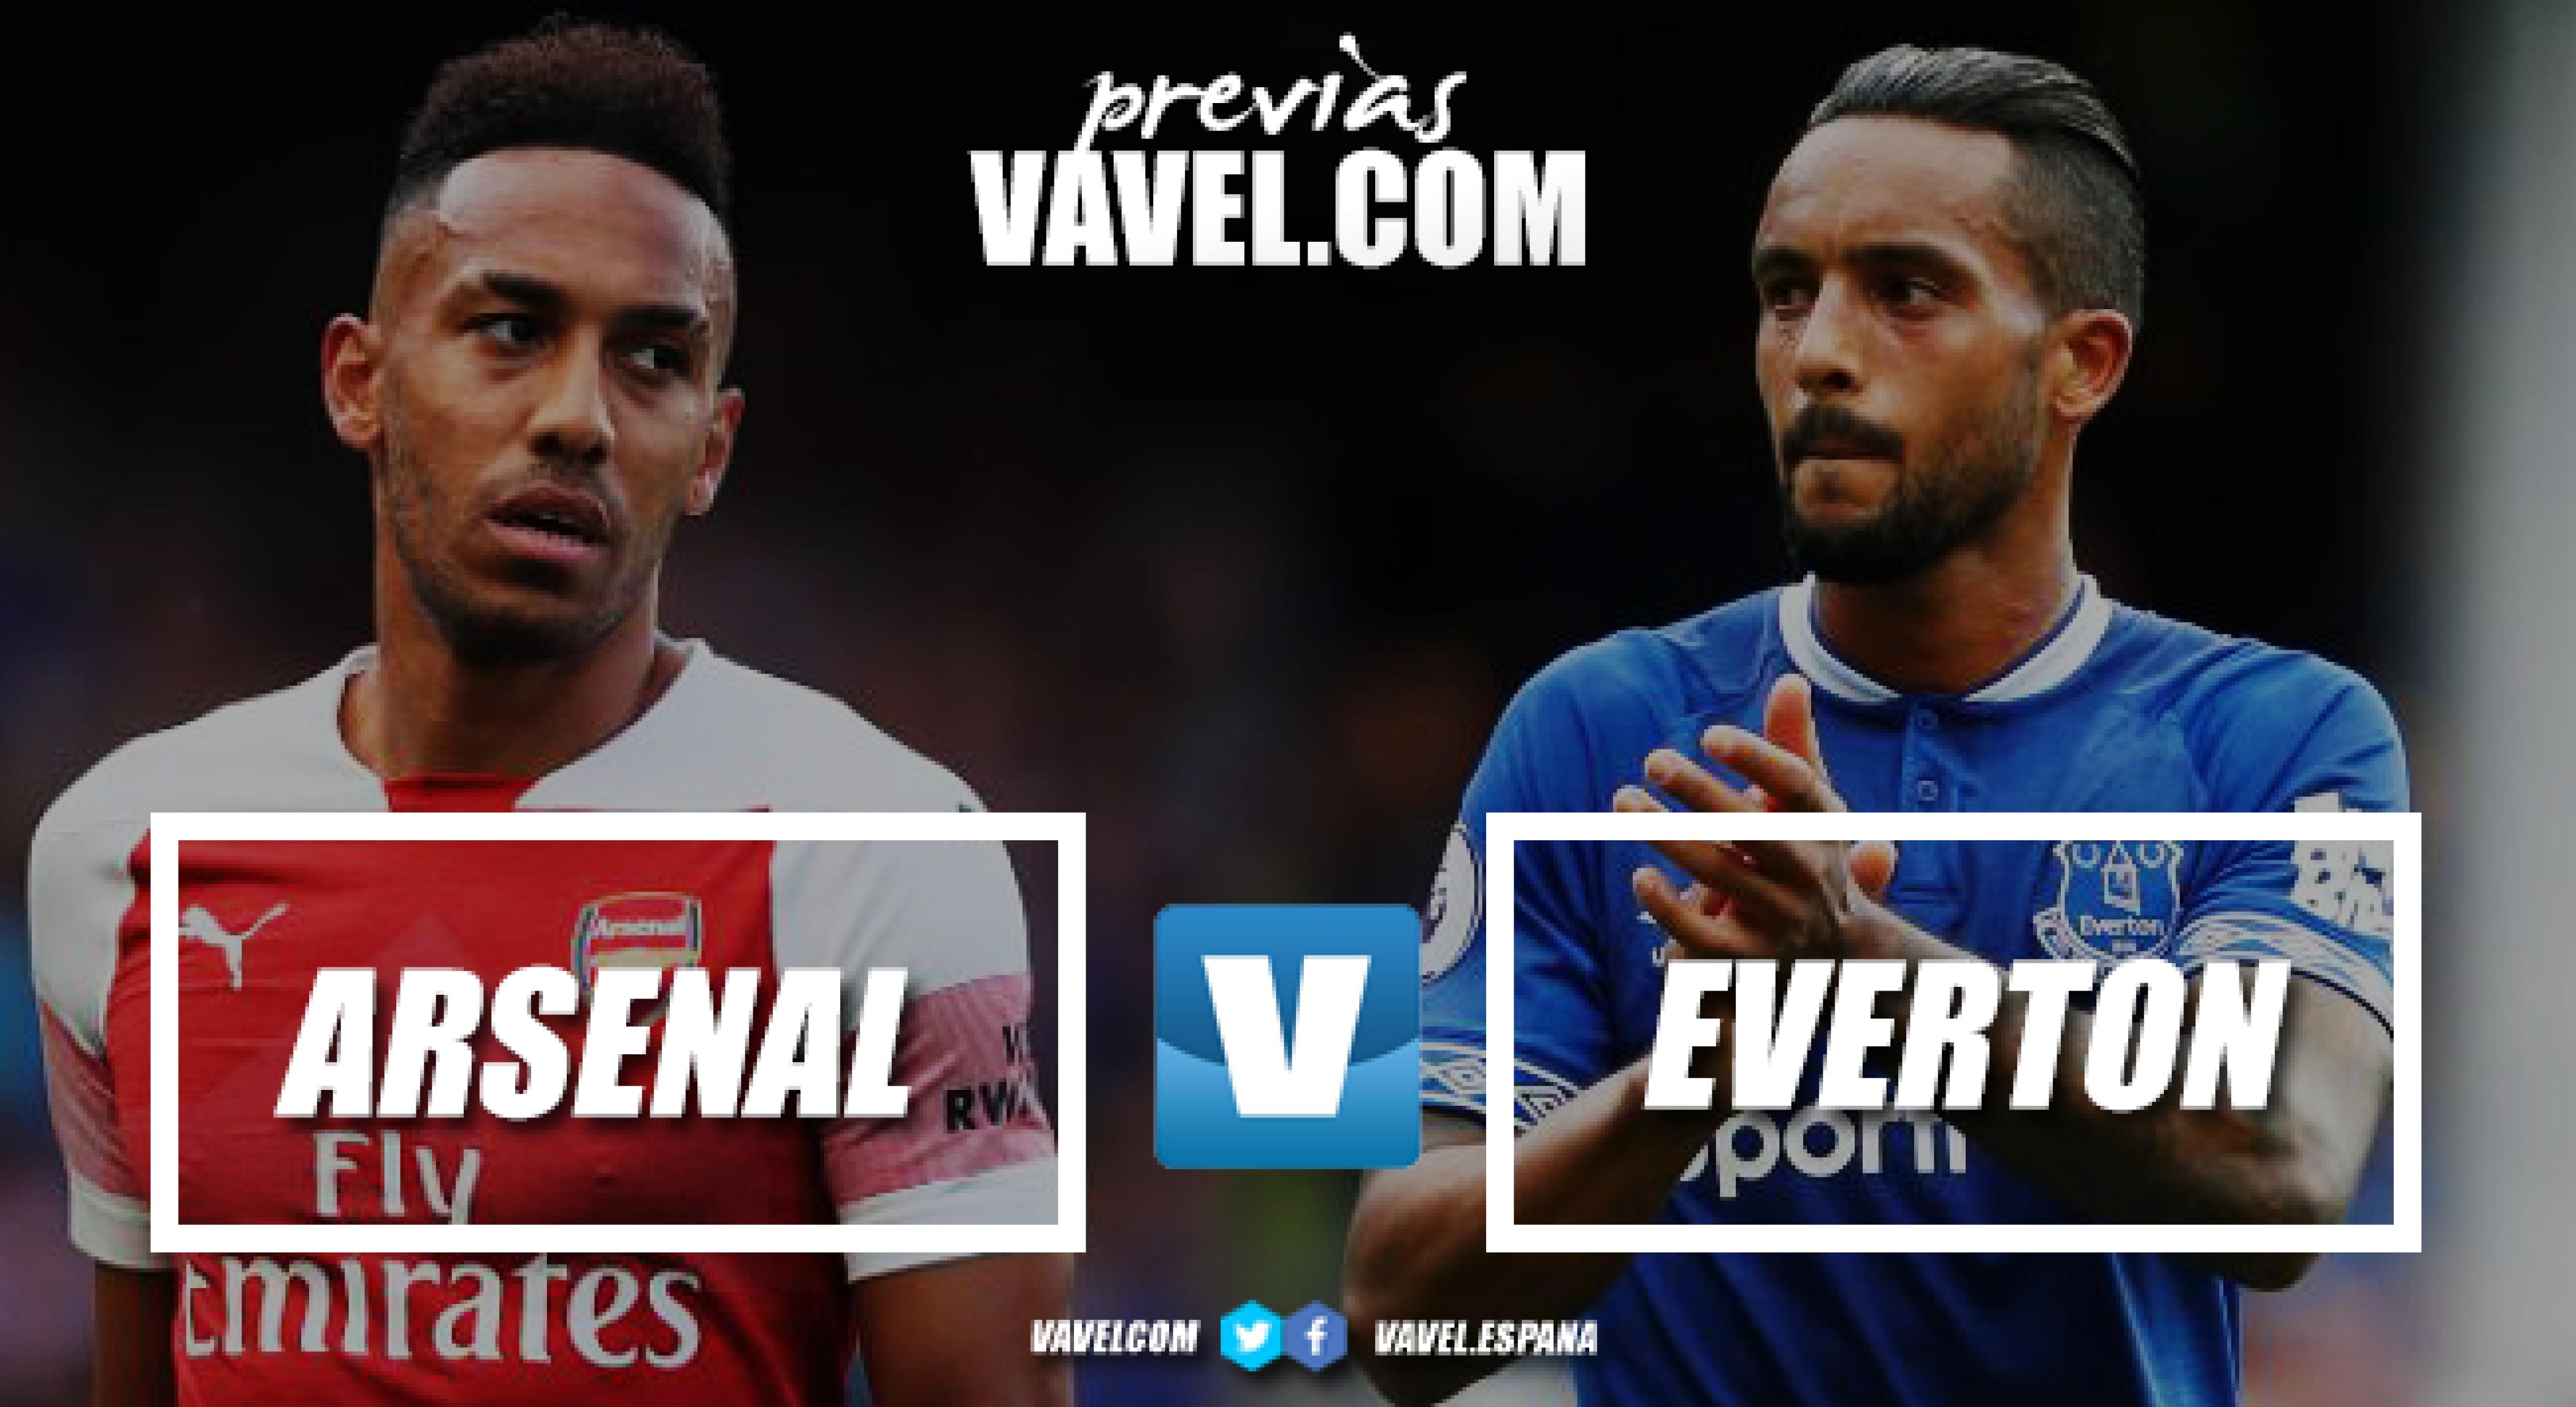 Arsenal vs Everton Preview: Blues facingtough task away to Emery's flying Gunners